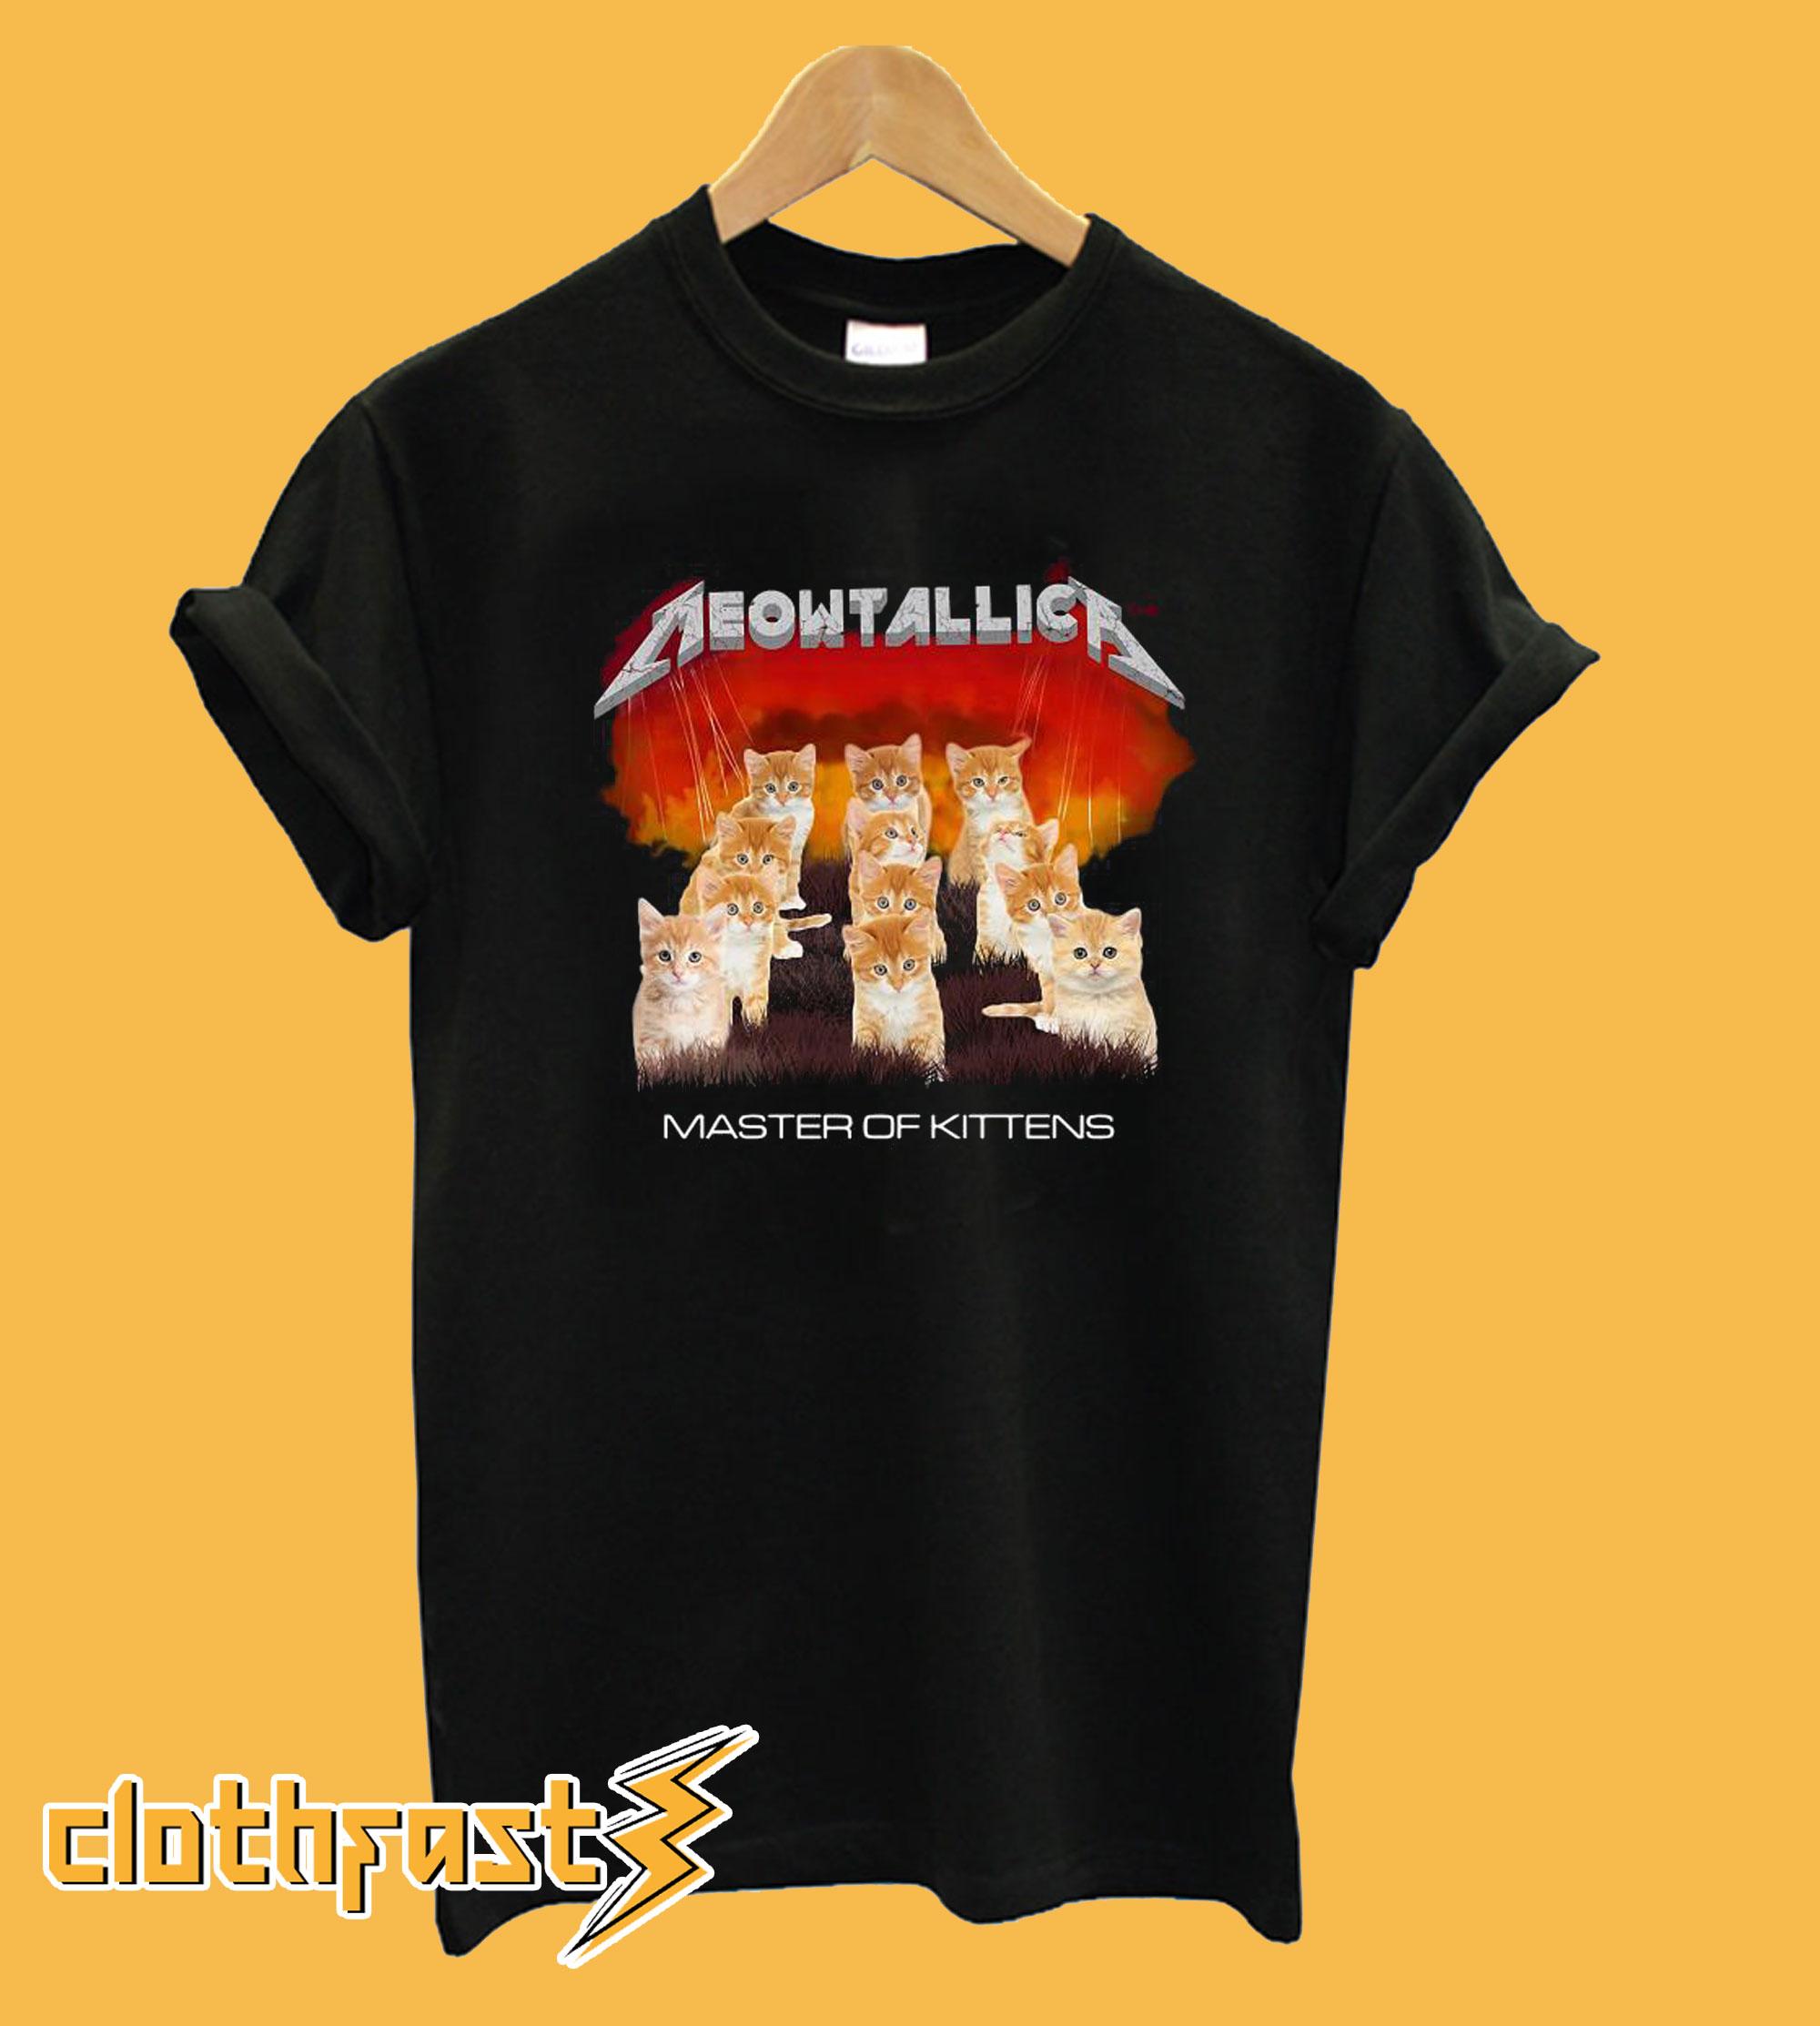 Meowtallica Master of Kittens T-Shirt